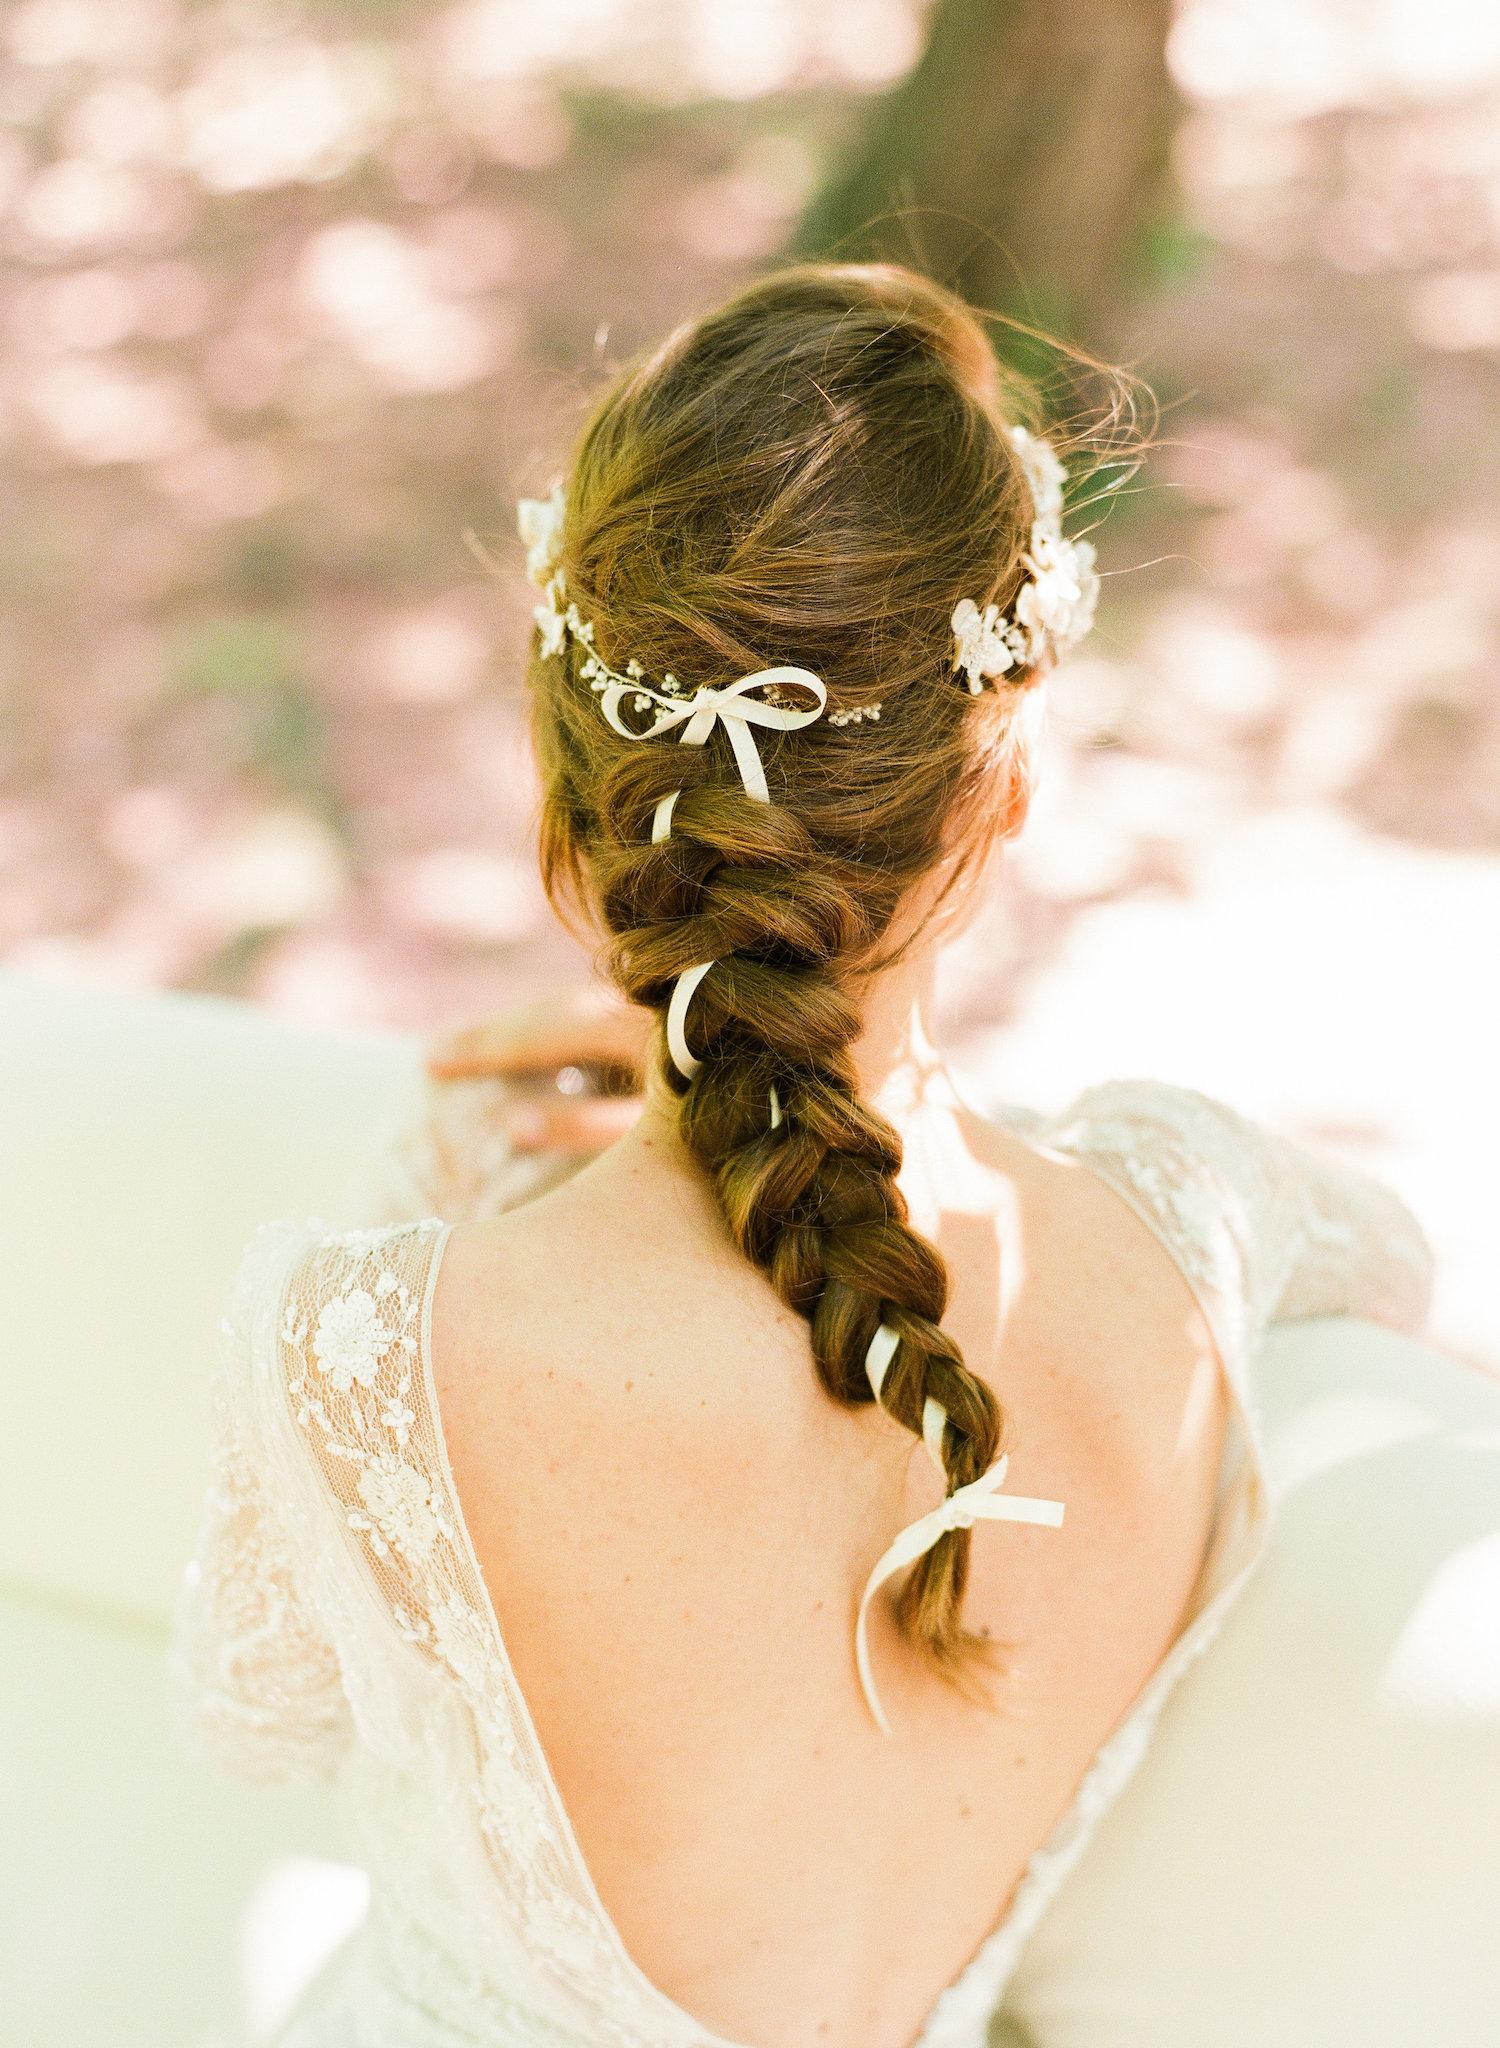 Morning Glow - Full Aperture Floral & Lindsay Madden Photography 48.jpeg